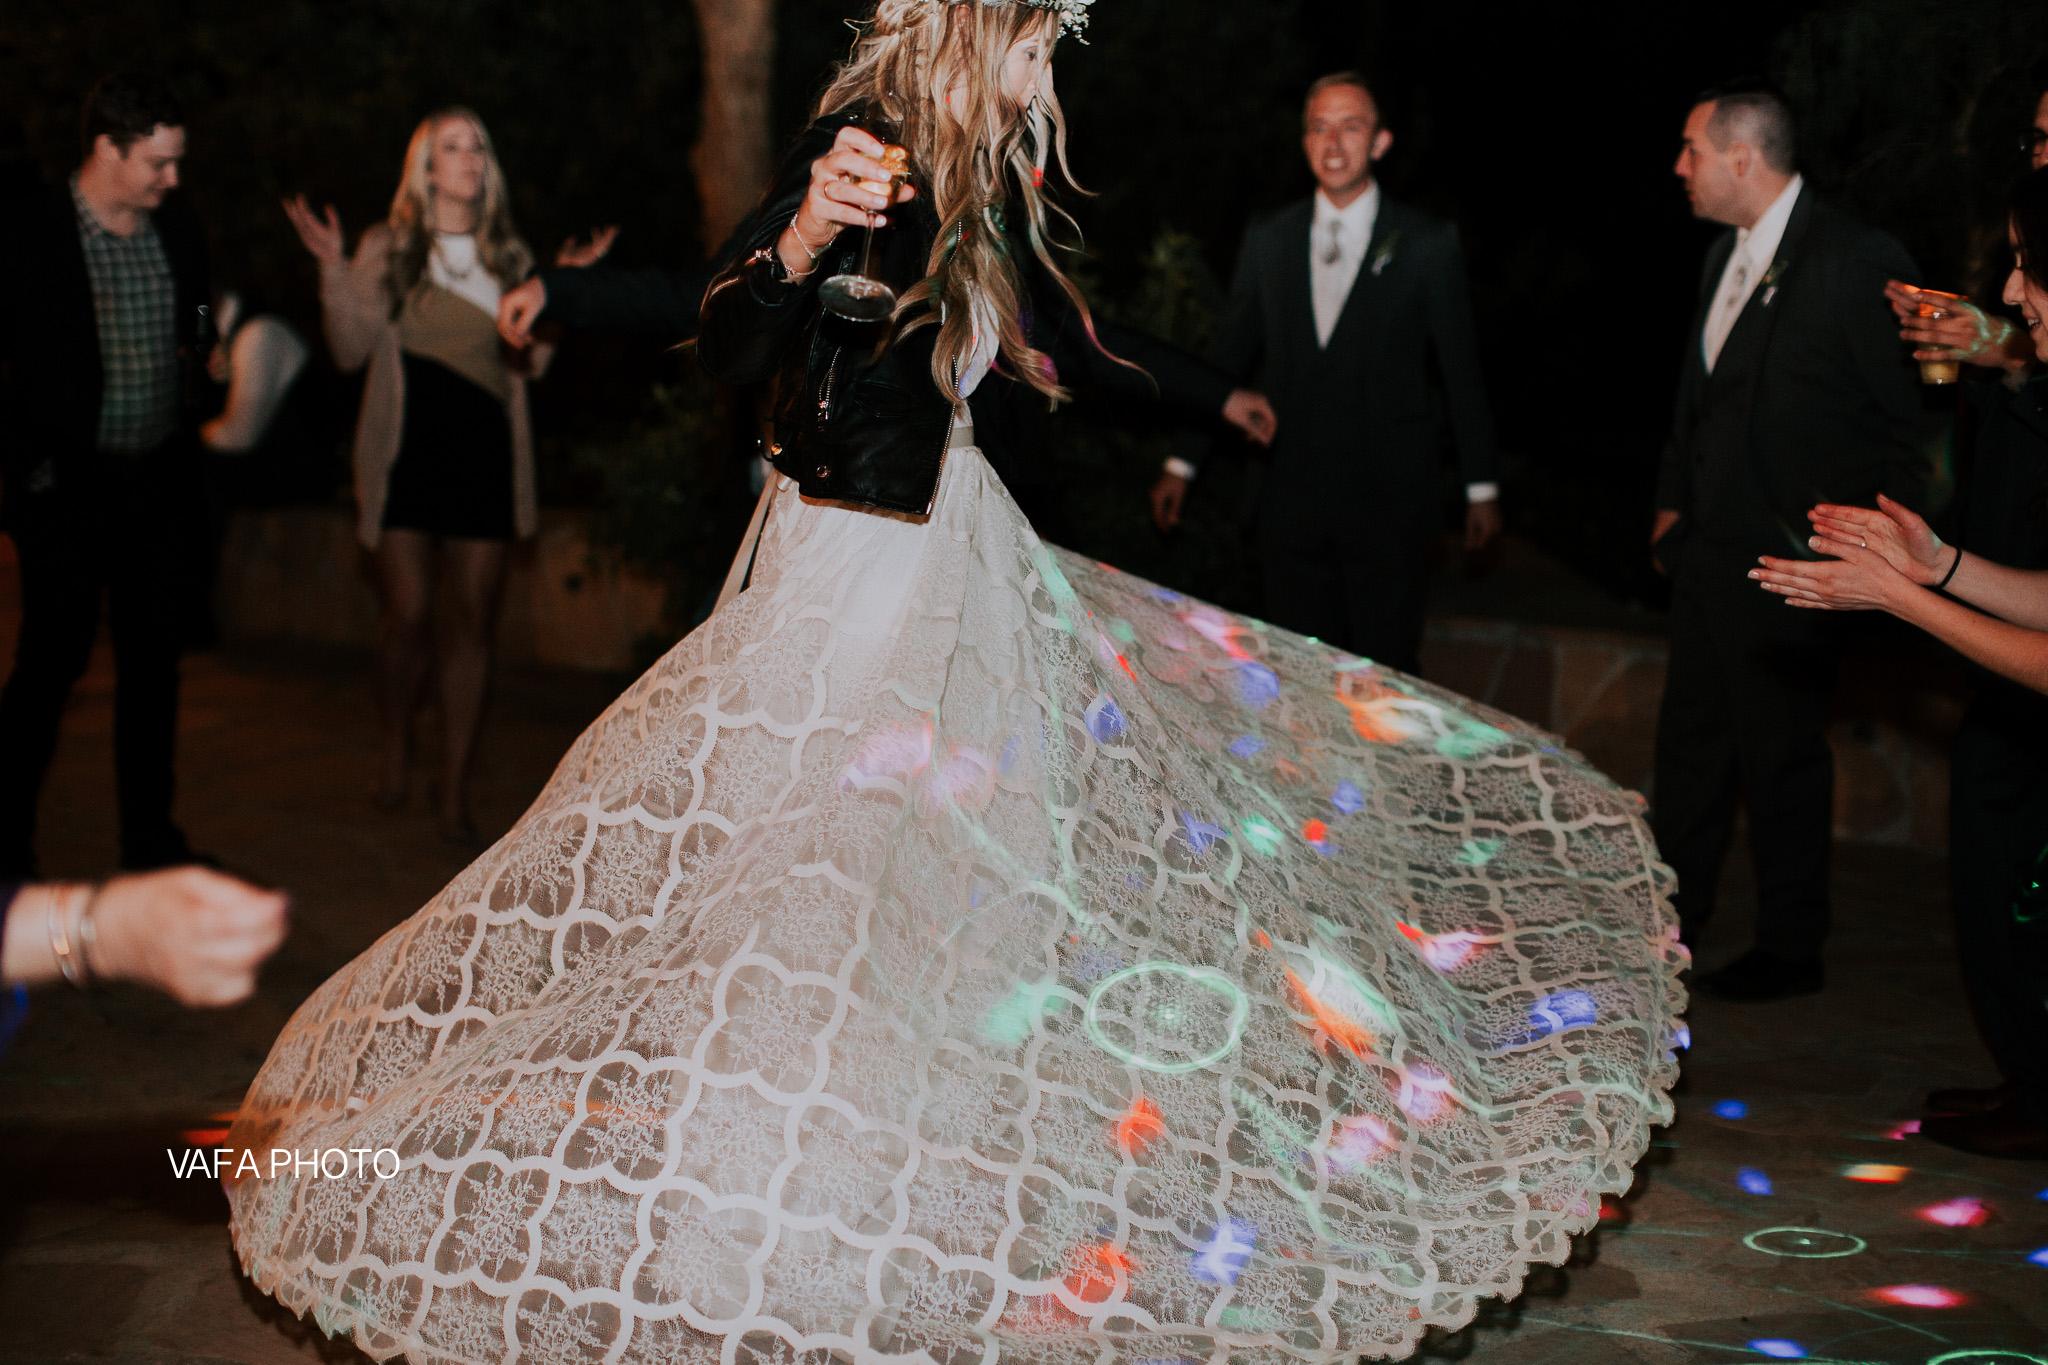 Leo-Carrillo-Ranch-Wedding-Lauren-Mike-Vafa-Photo-1217.jpg